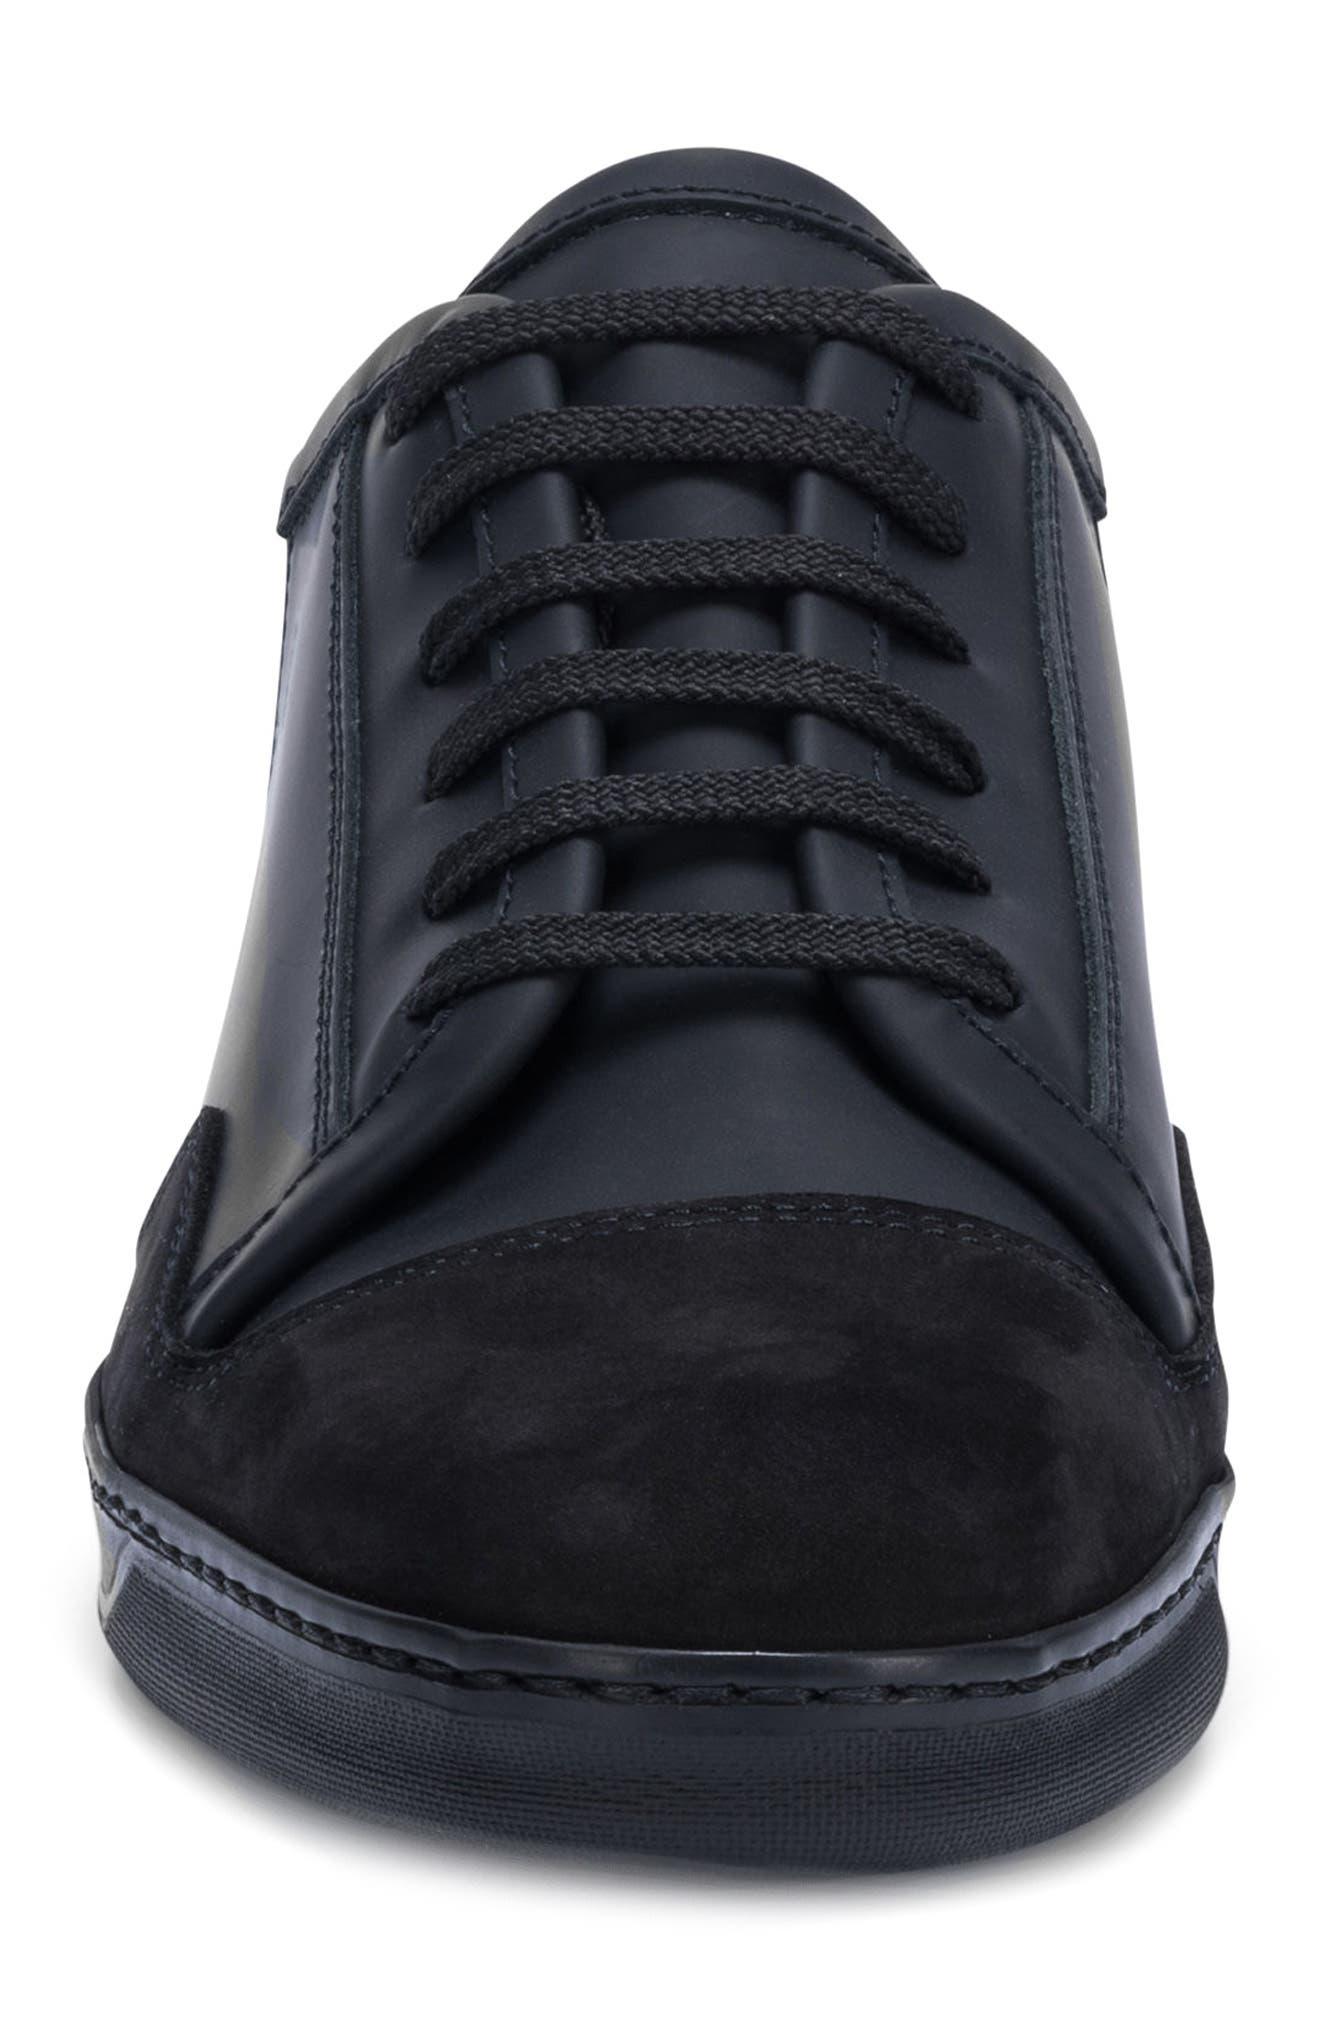 Bellagio Sneaker,                             Alternate thumbnail 4, color,                             BLACK